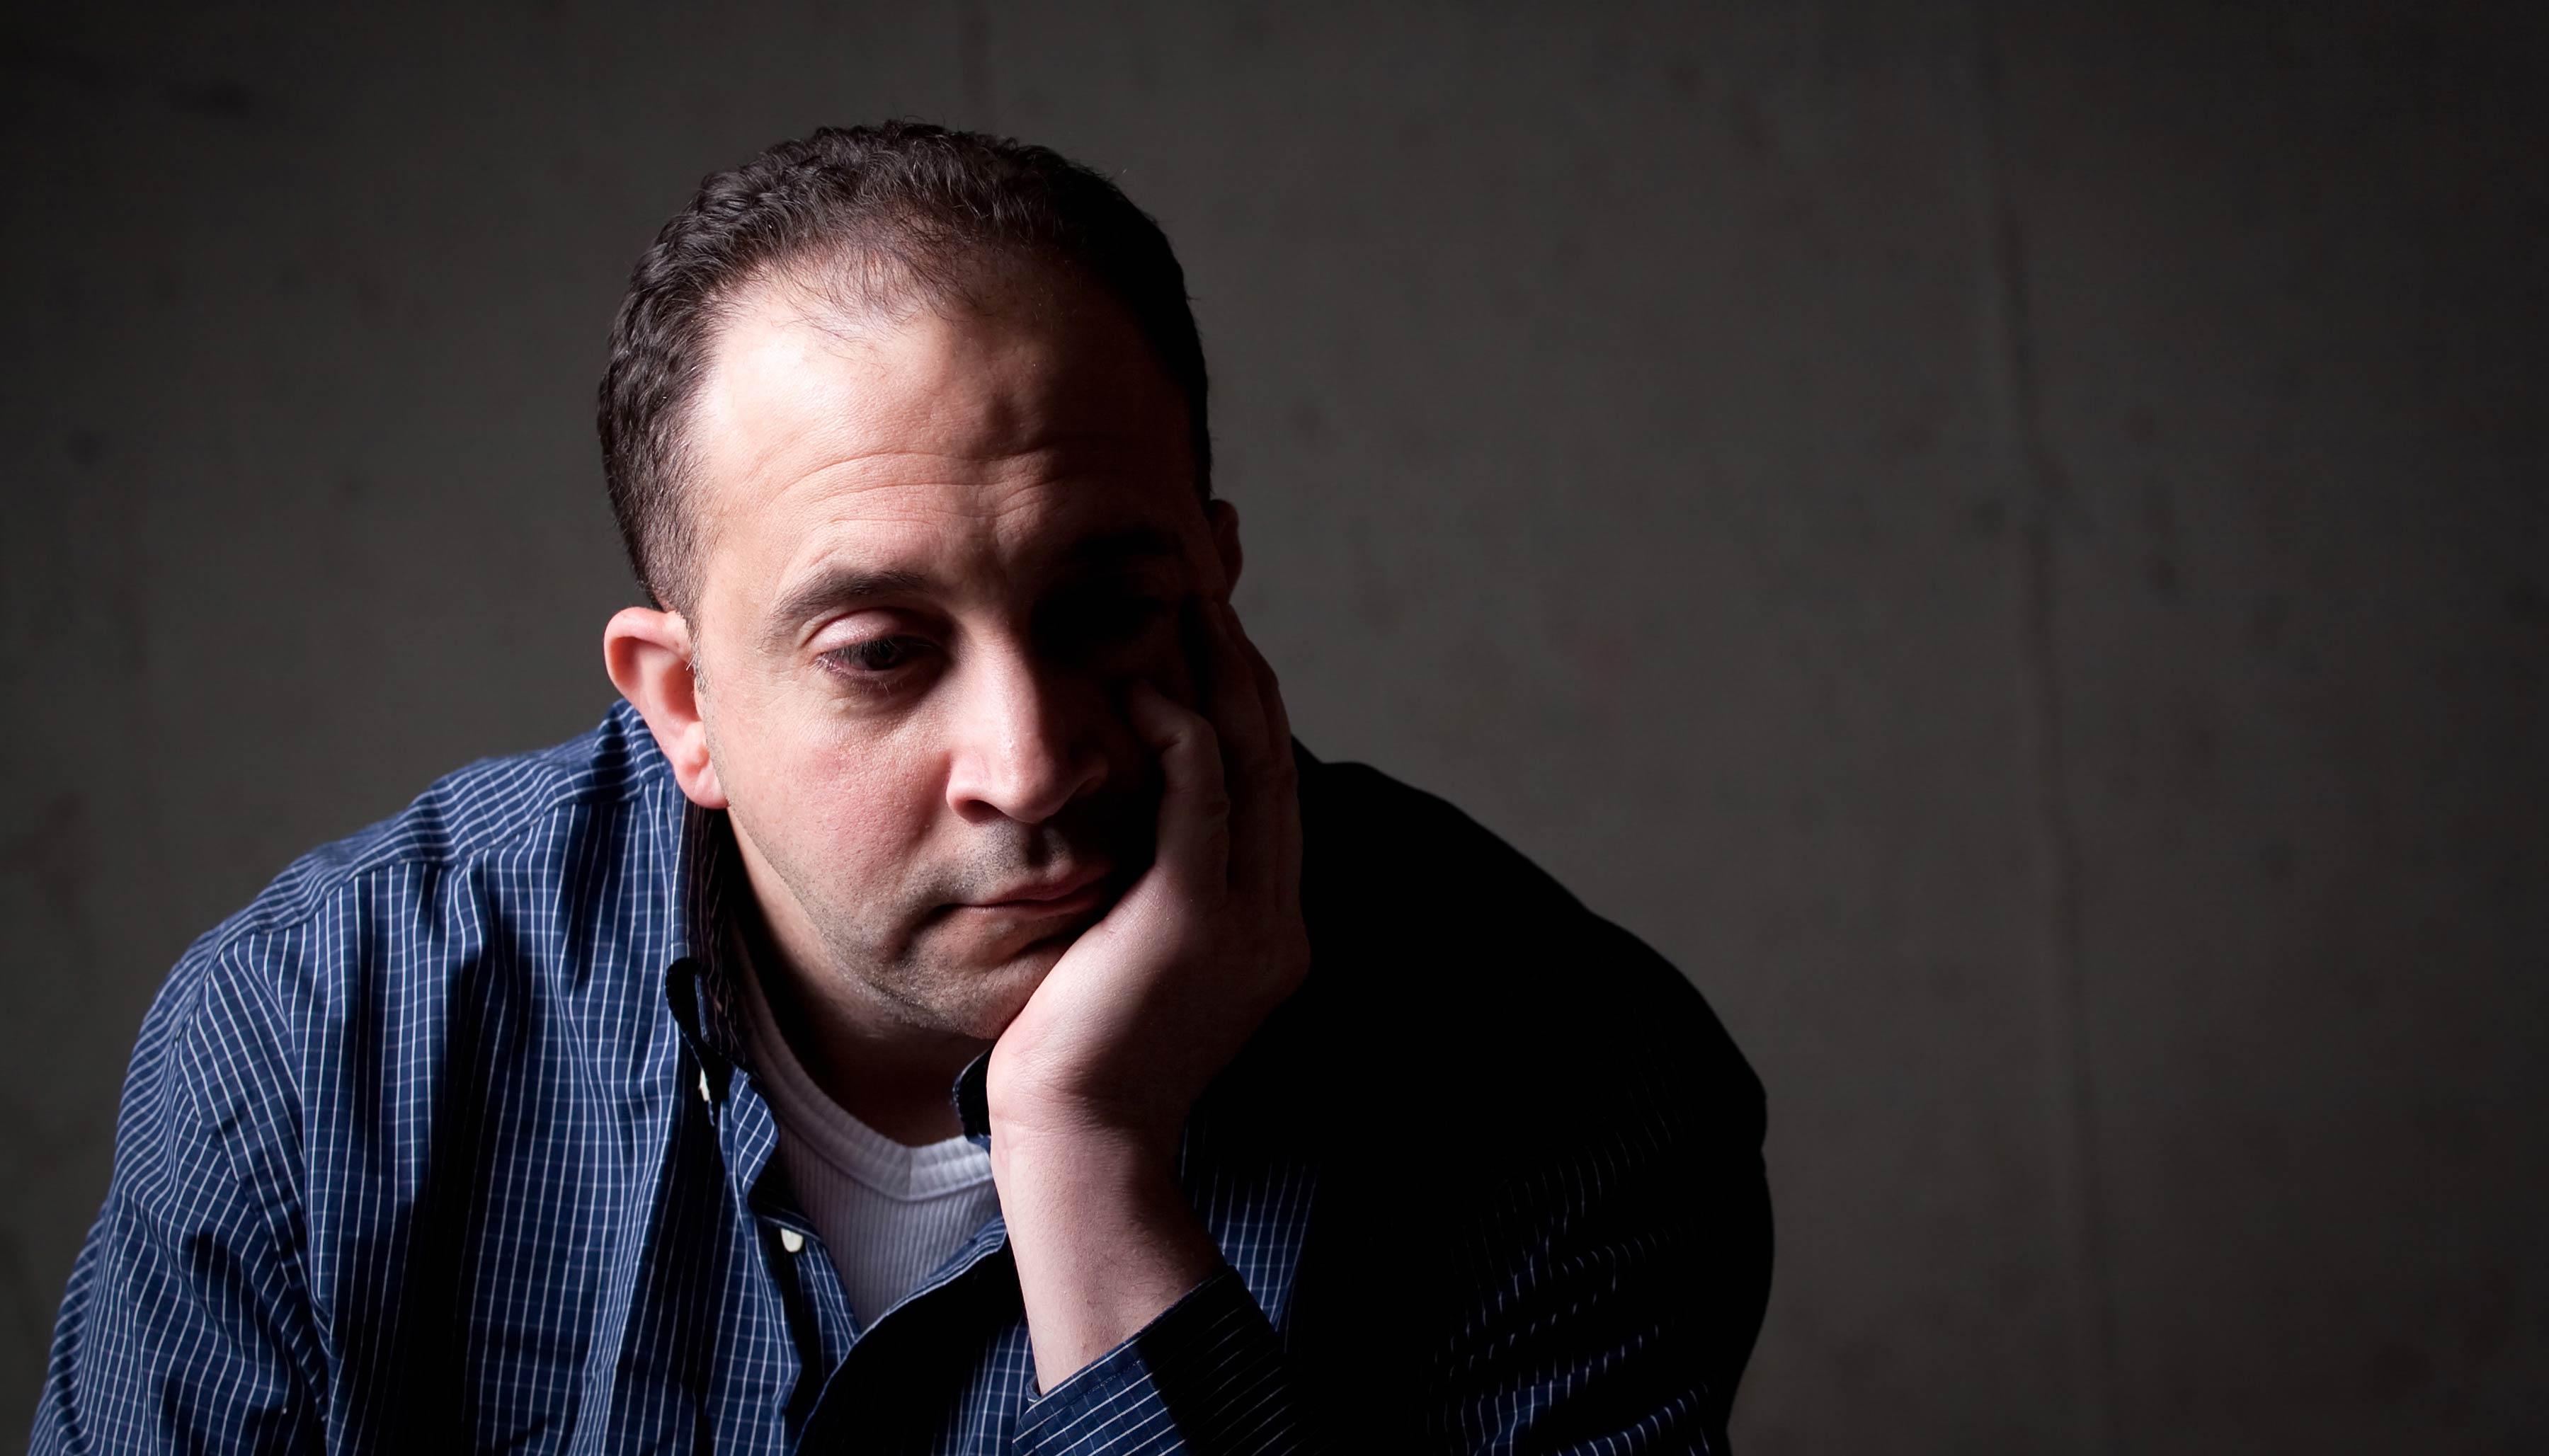 Irritable Bowel Syndrome image